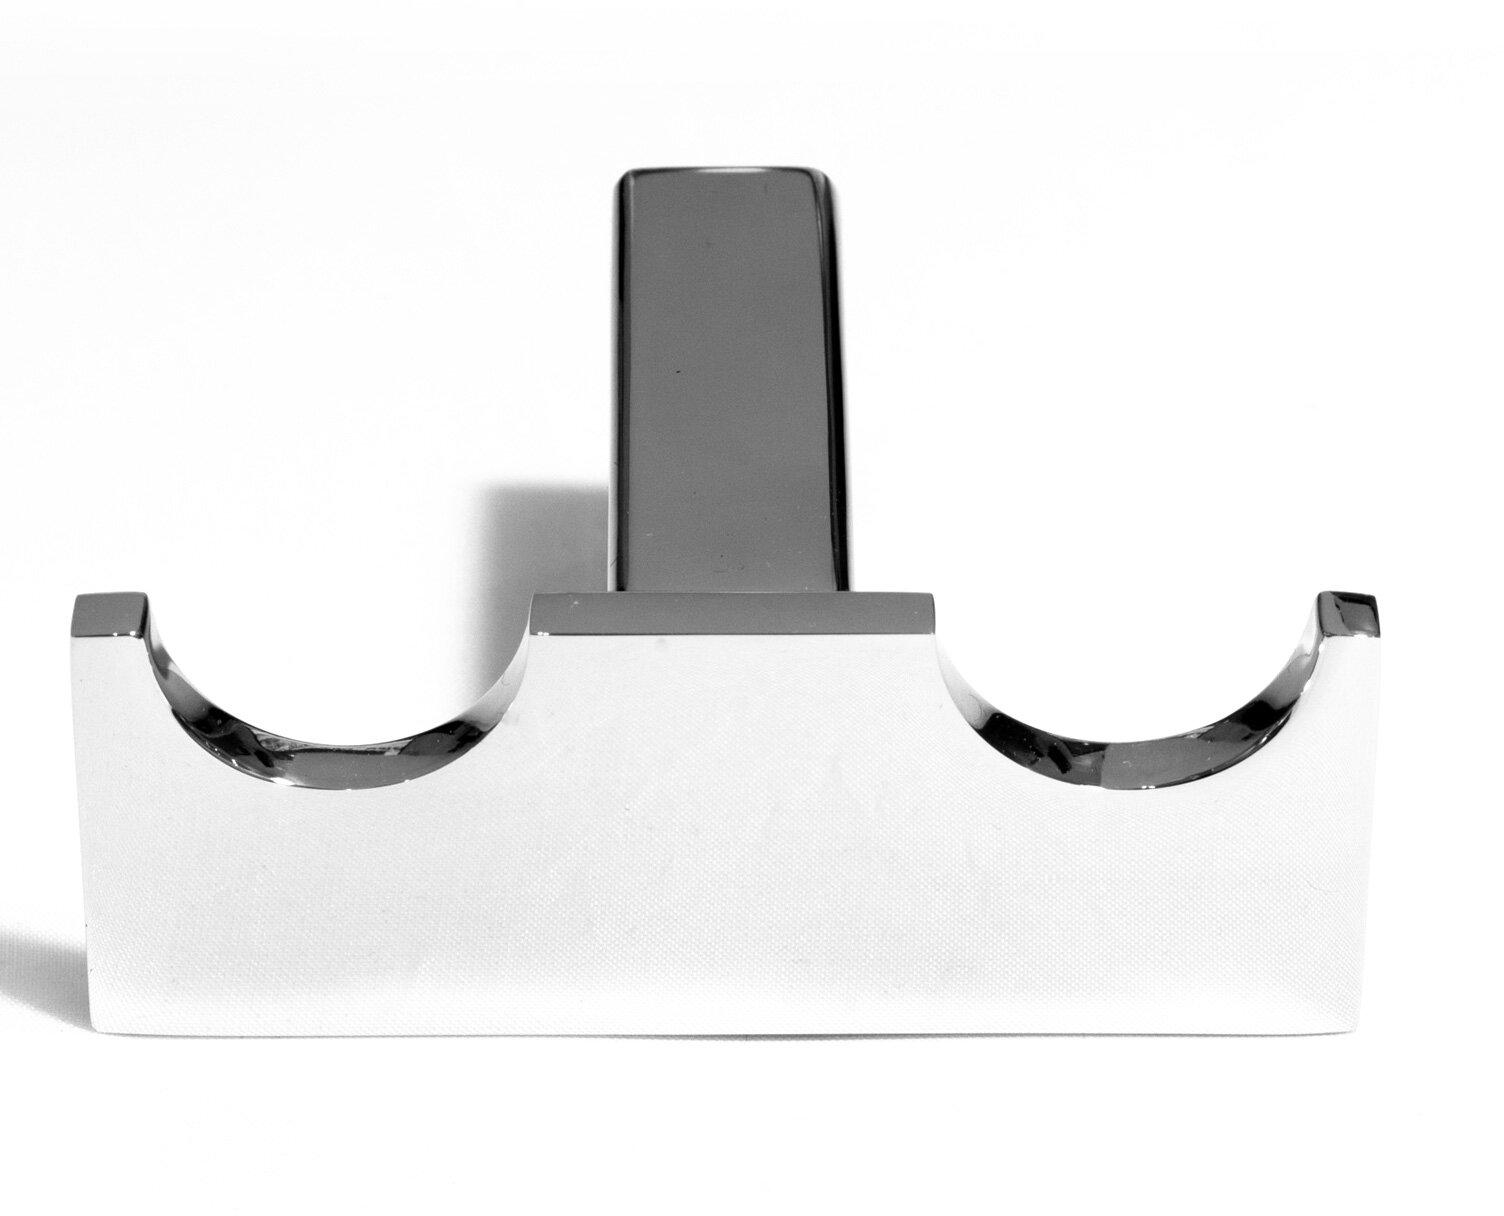 Premium Grade Solid Stainless Steel